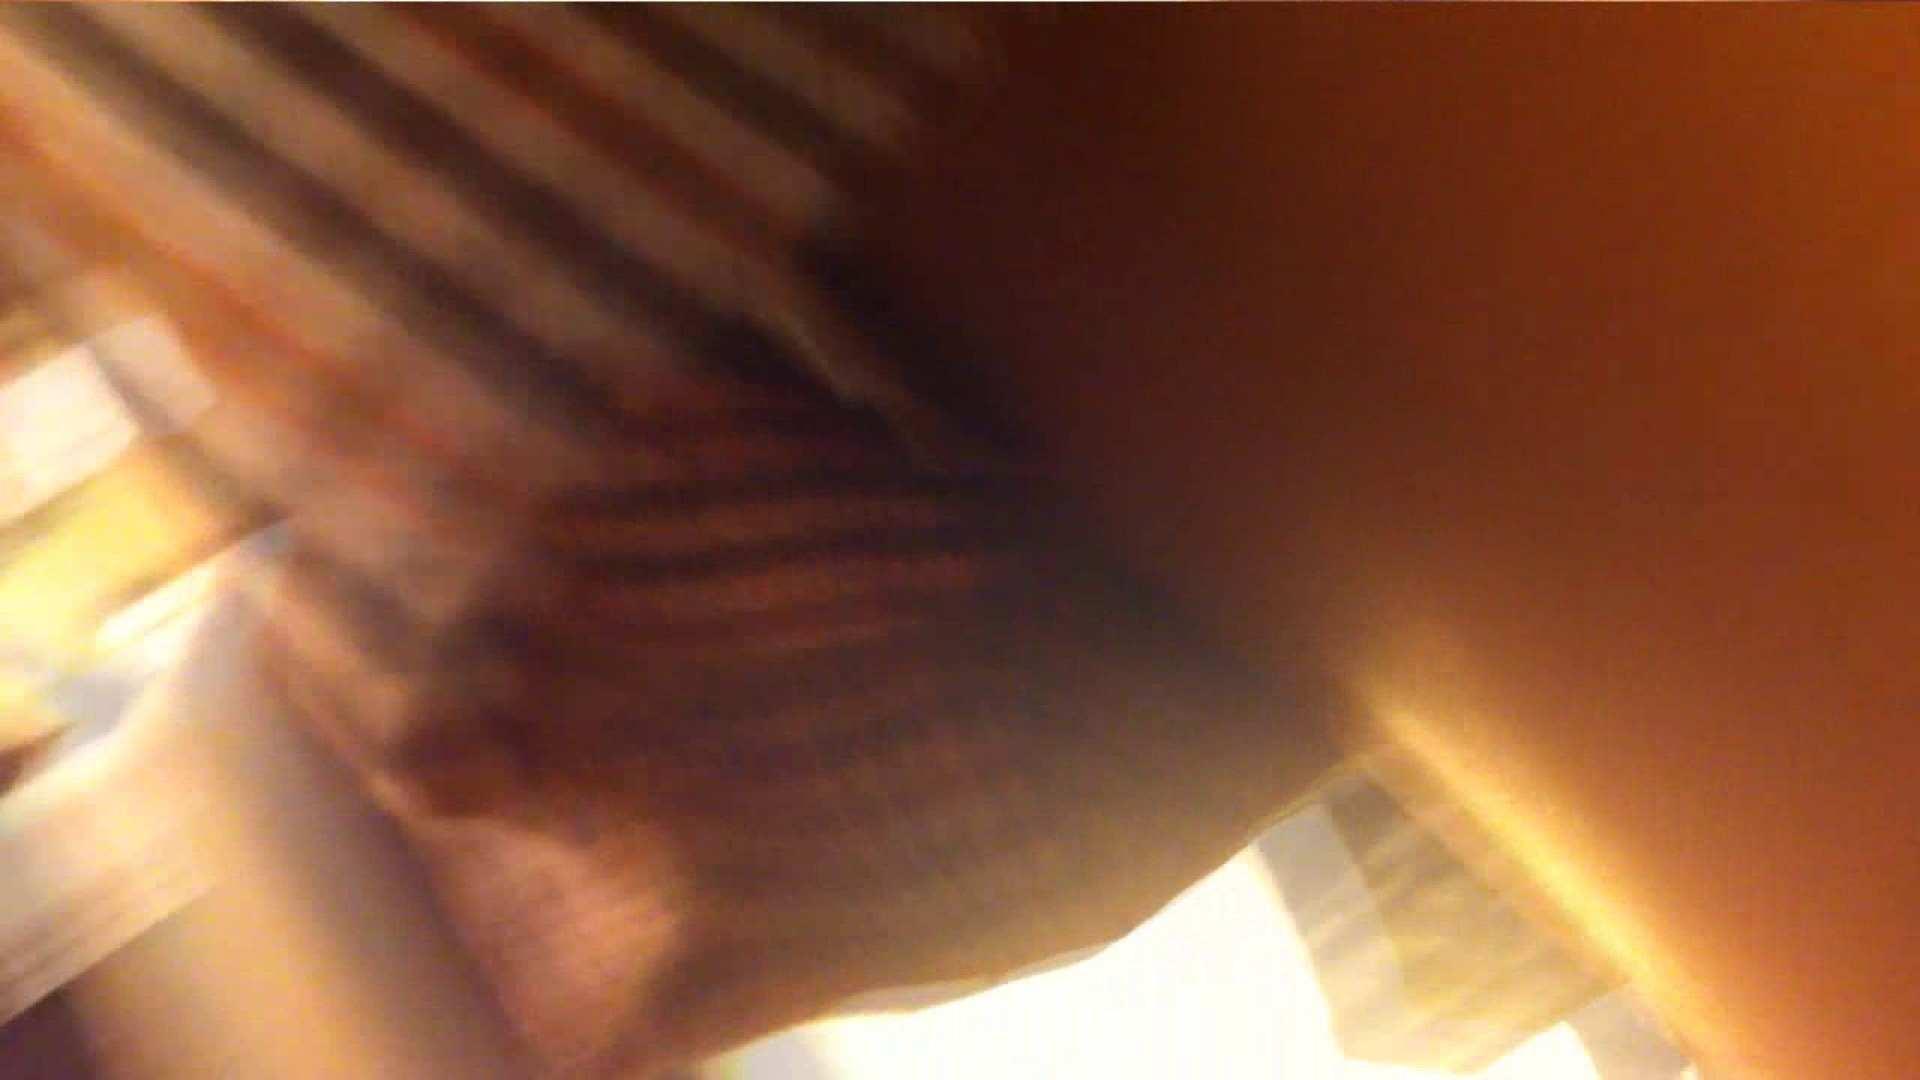 vol.34 美人アパレル胸チラ&パンチラ メガネ属性っていいよね♥ 接写 おめこ無修正動画無料 95画像 88